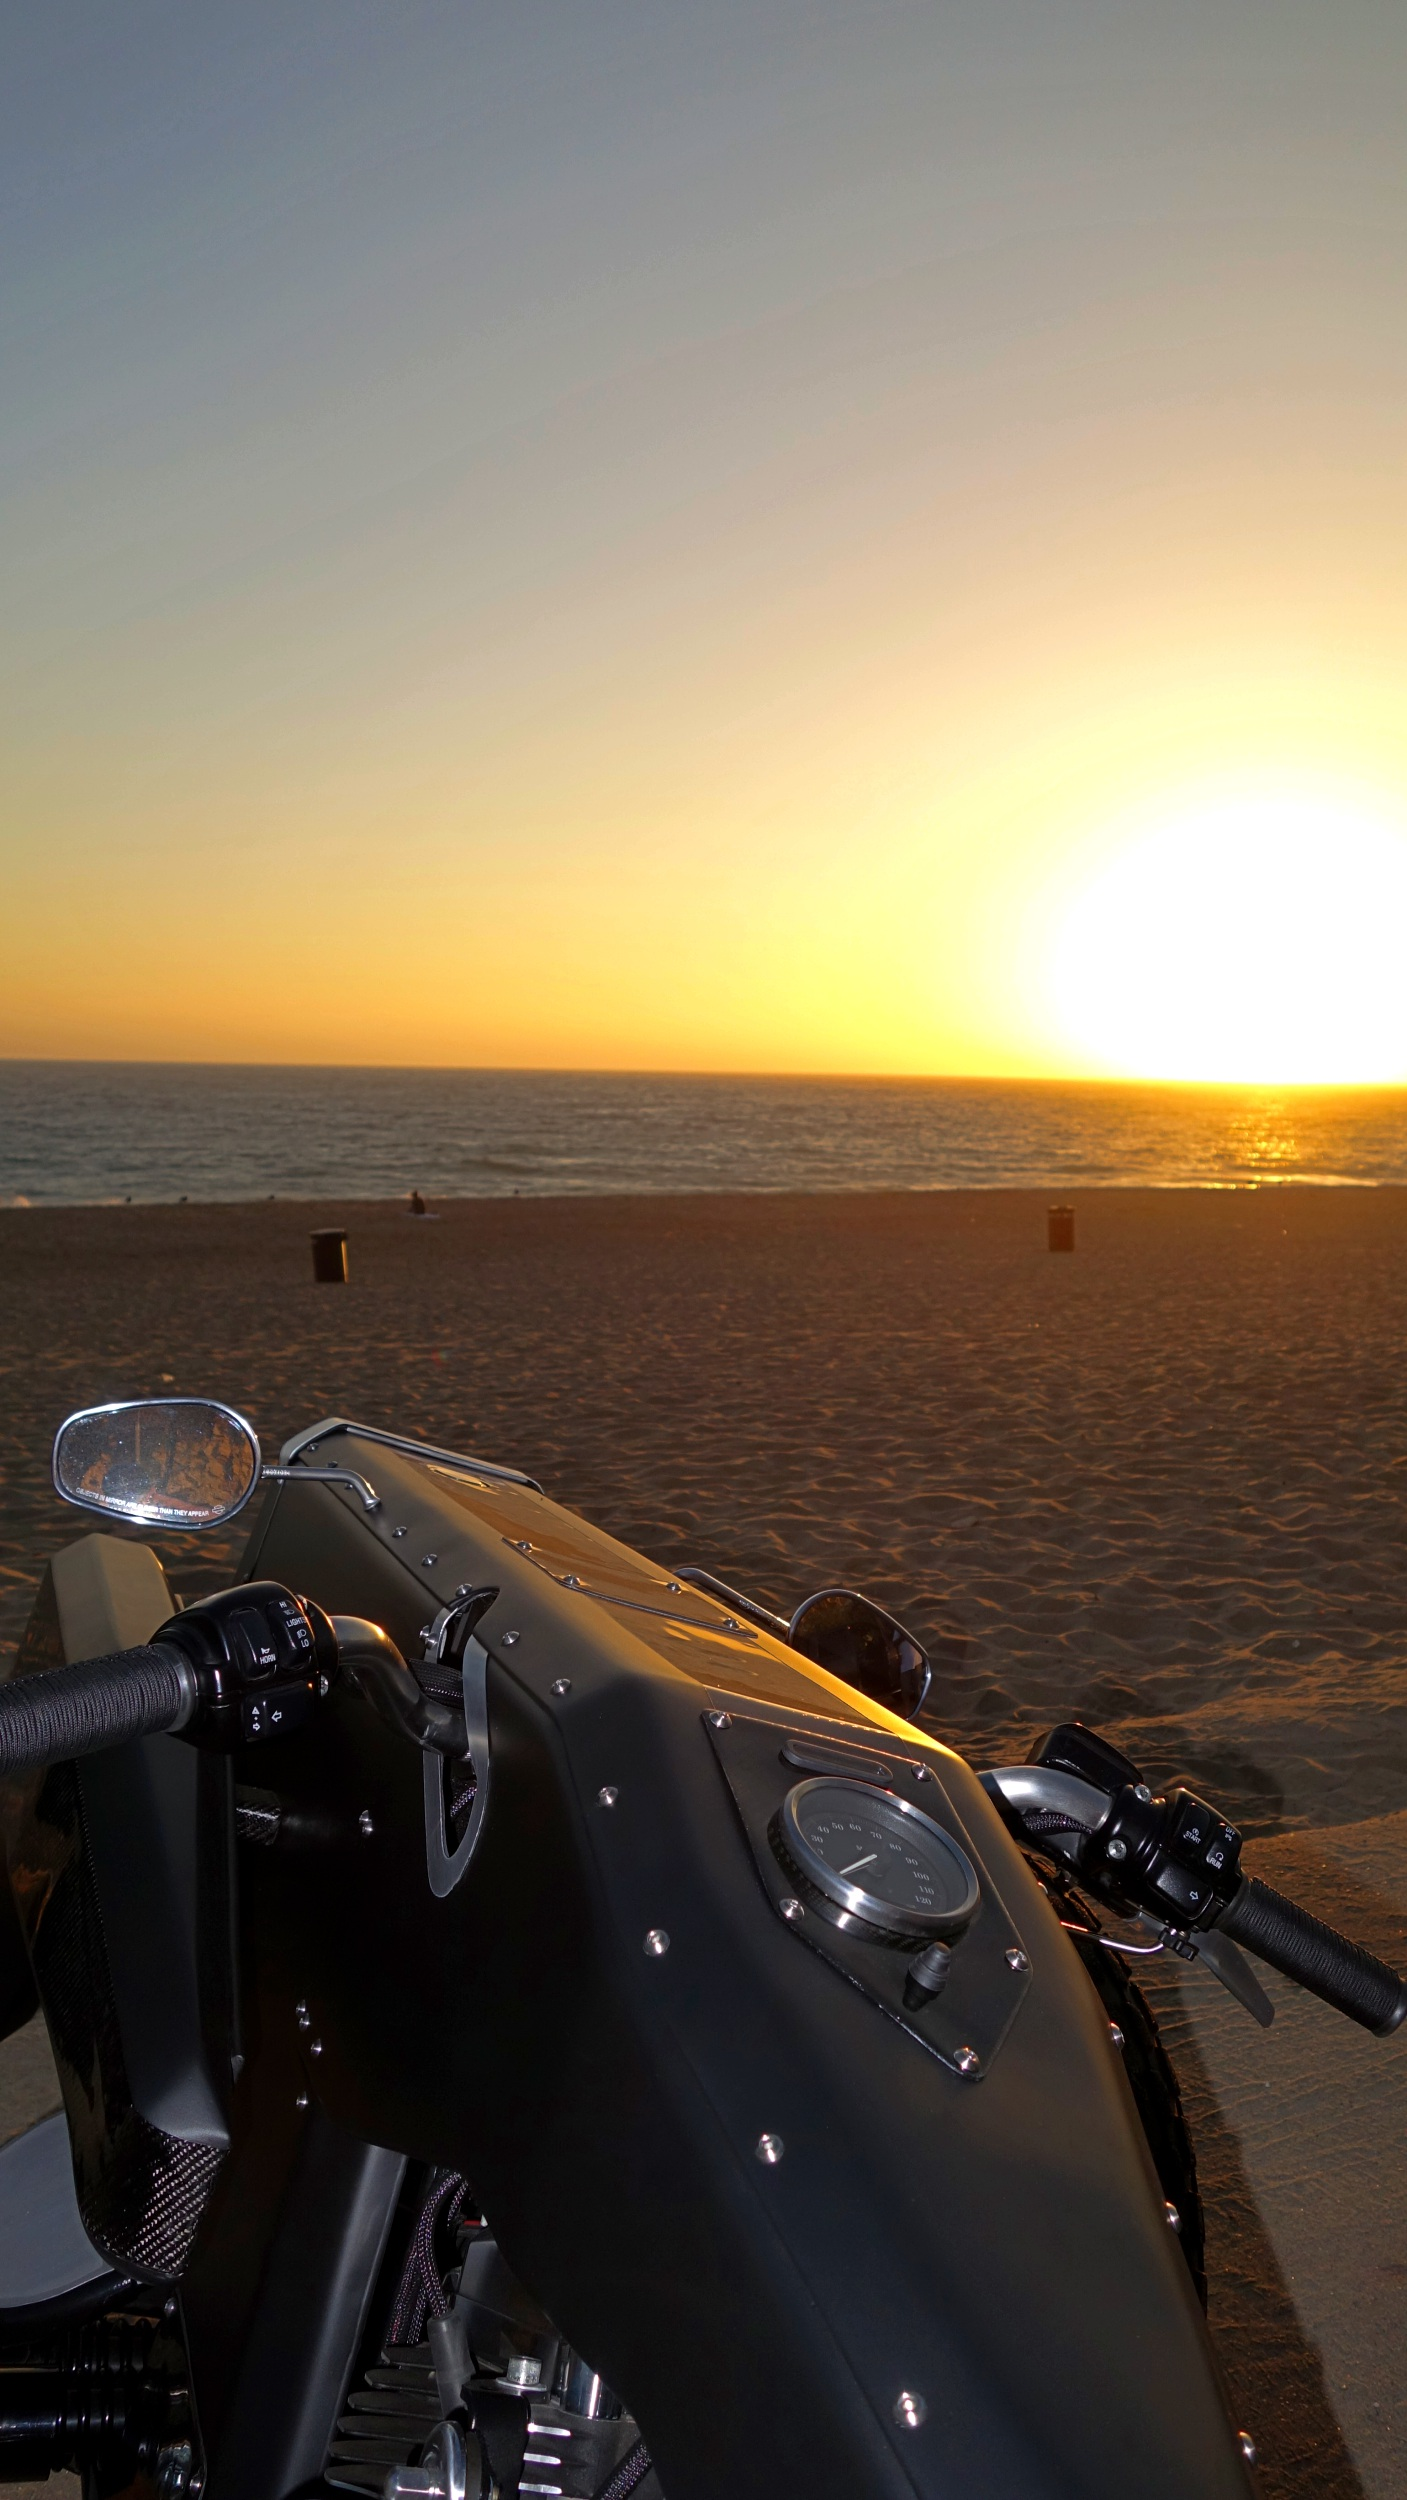 Garmr - Nose - Sunset - Sunset Beach - 2500px - V1 .jpg